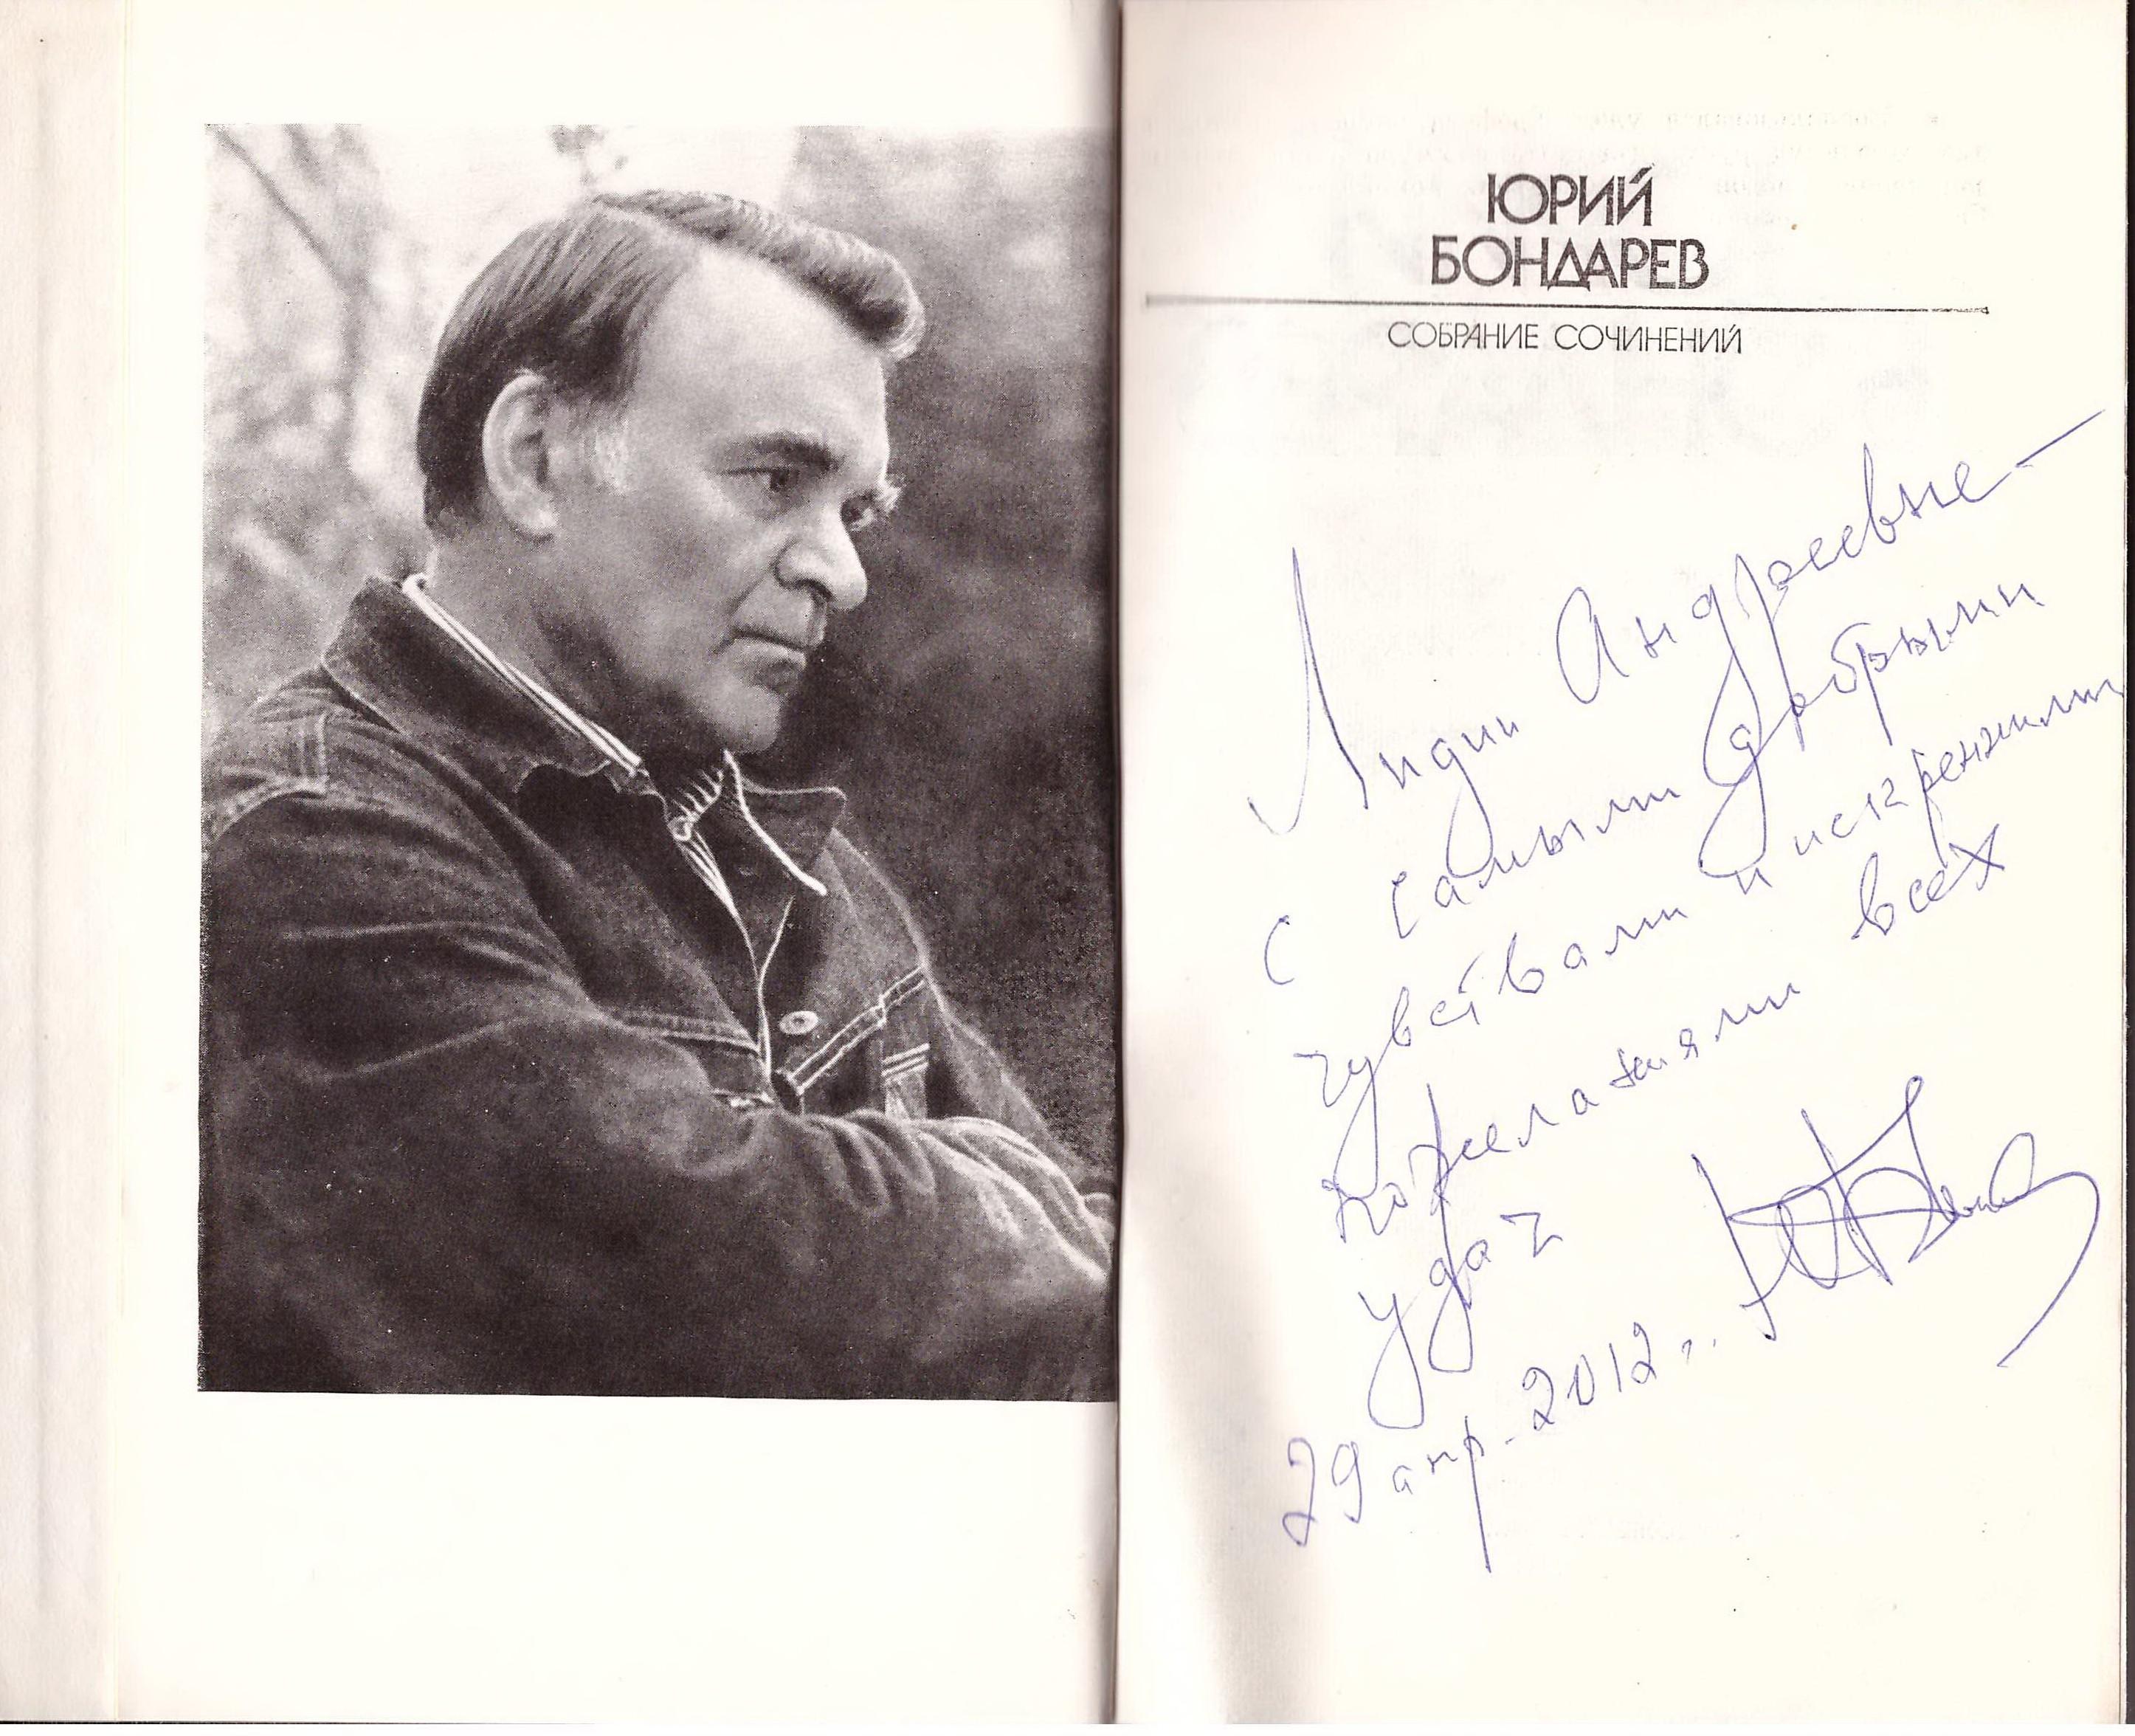 Картинки по запросу бондарев ЮРИЙ